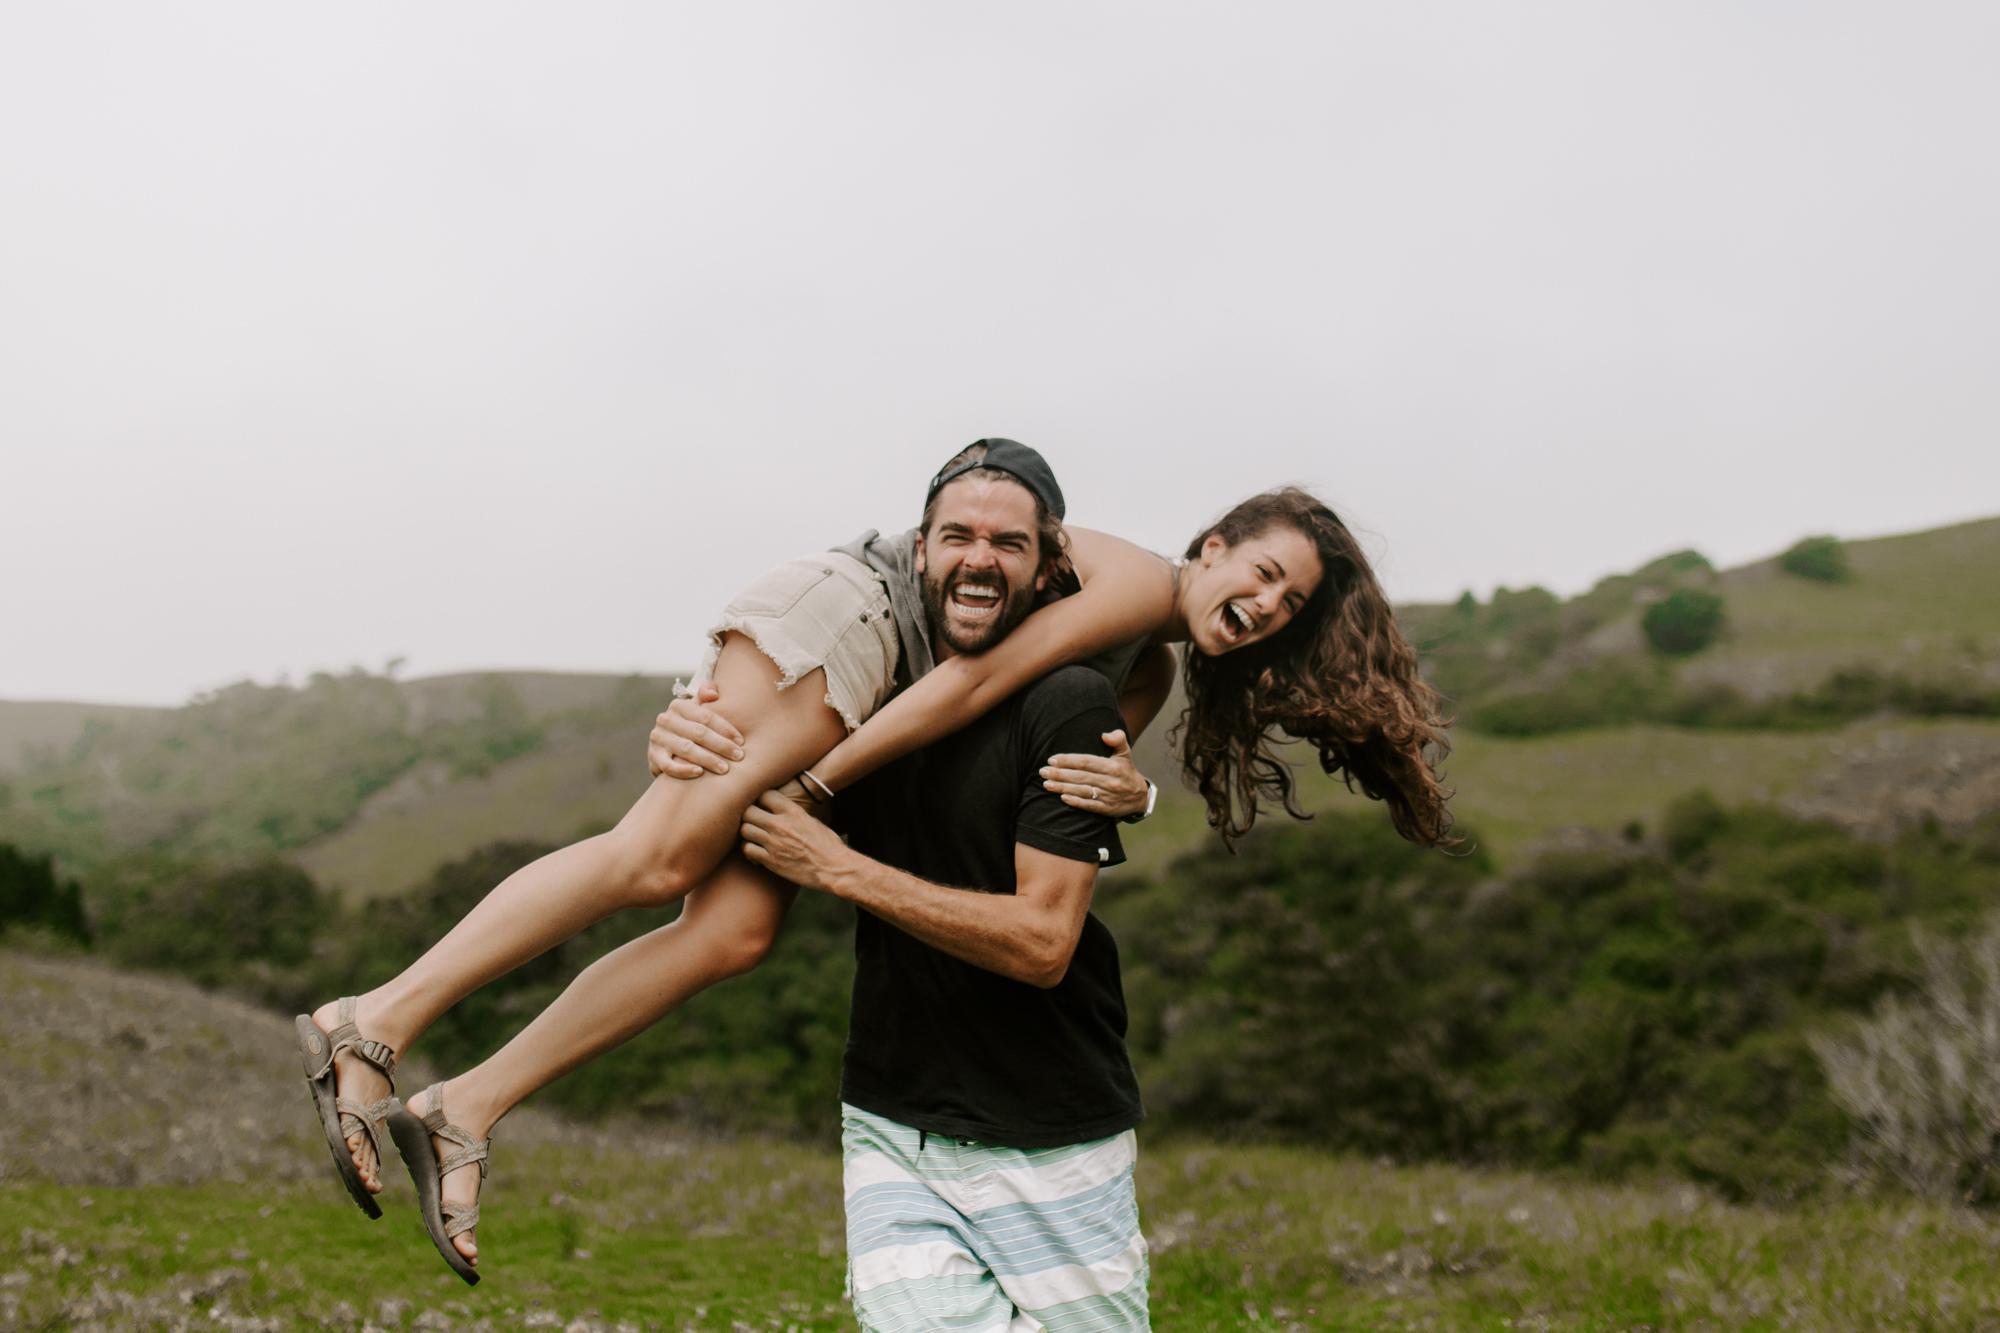 smiling-couple-running-through-waimea-hills-hawaii.jpg